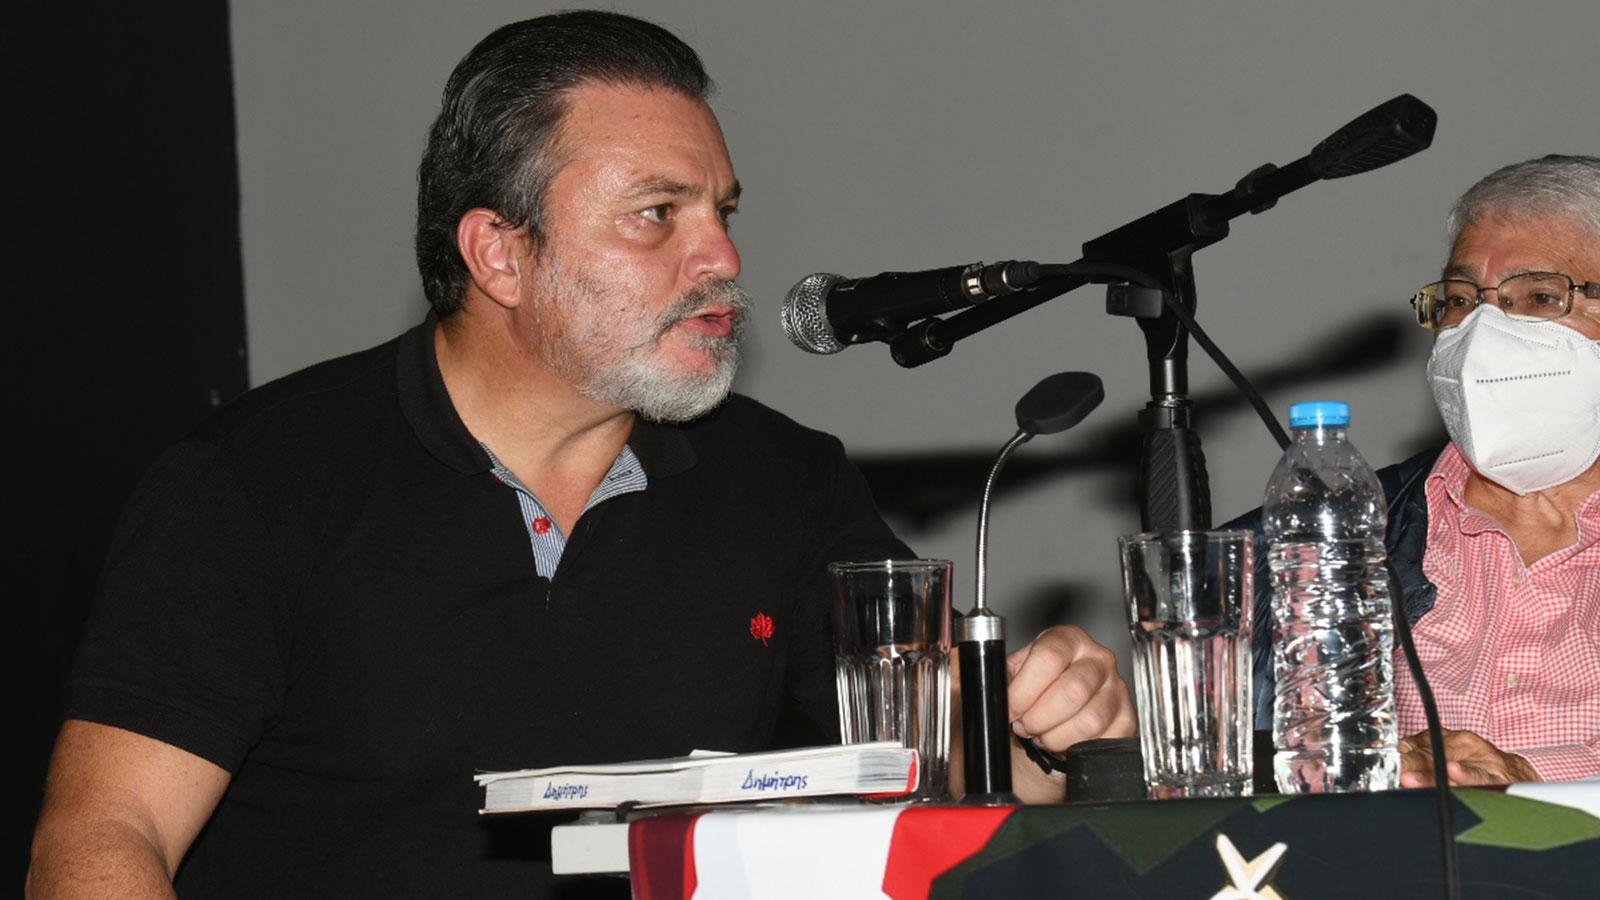 Comandante Ernesto Che Guevara Έμπνευση και υπόσχεση αγώνα για μια κοινωνία χωρίς εκμετάλλευση 7